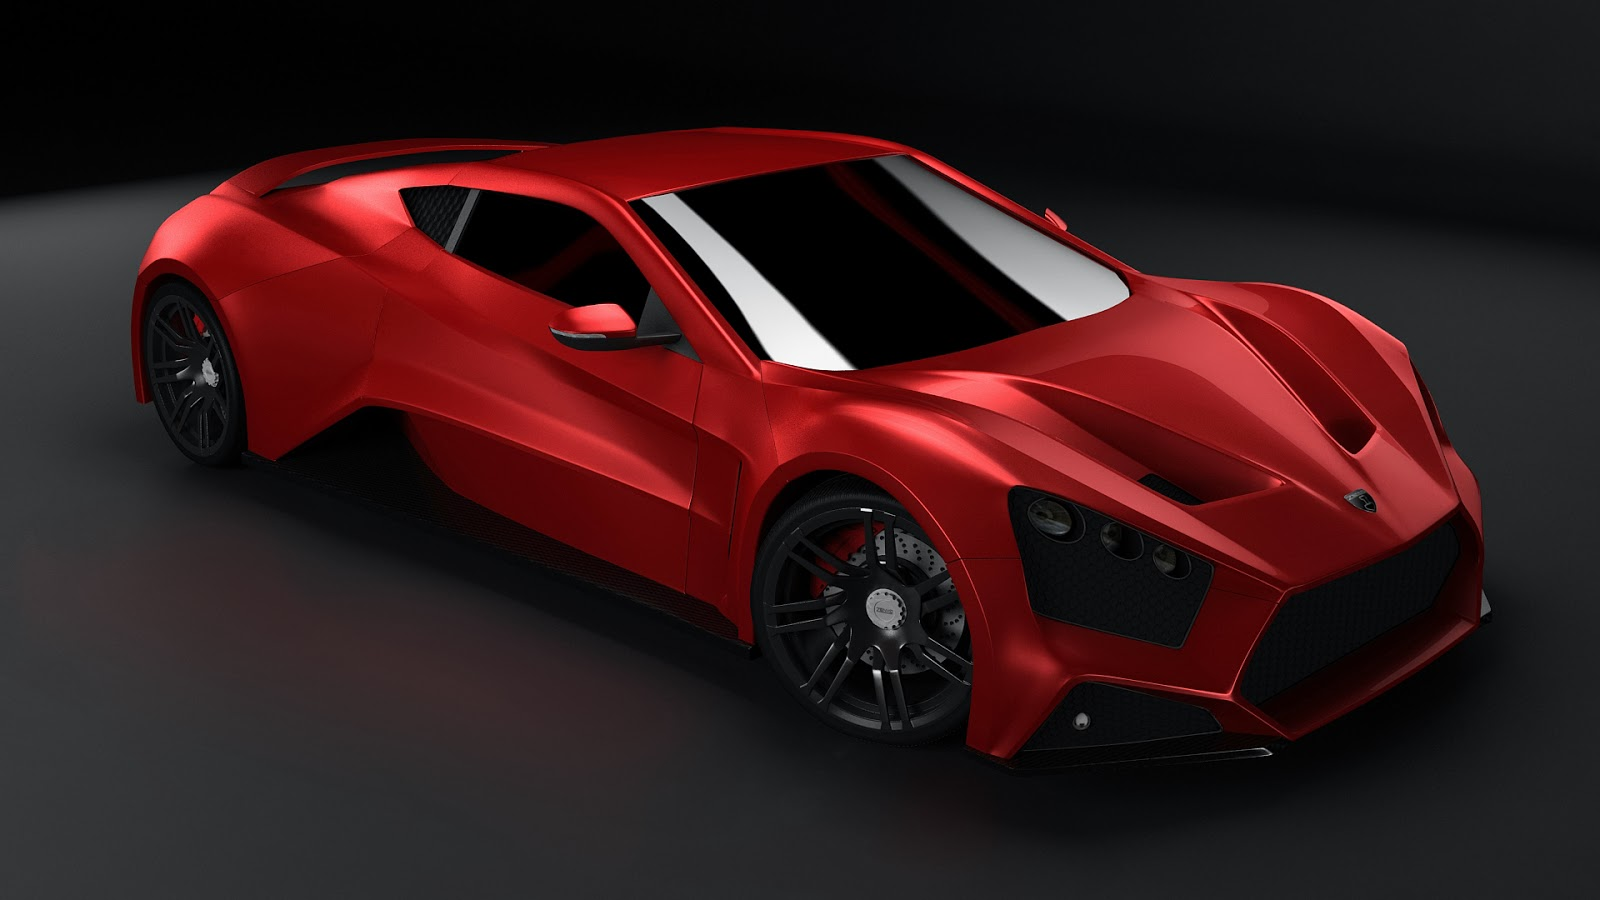 Zenvo St1 Price >> Zenvo ST1 in the List of world's Expensive Car | New Car ...